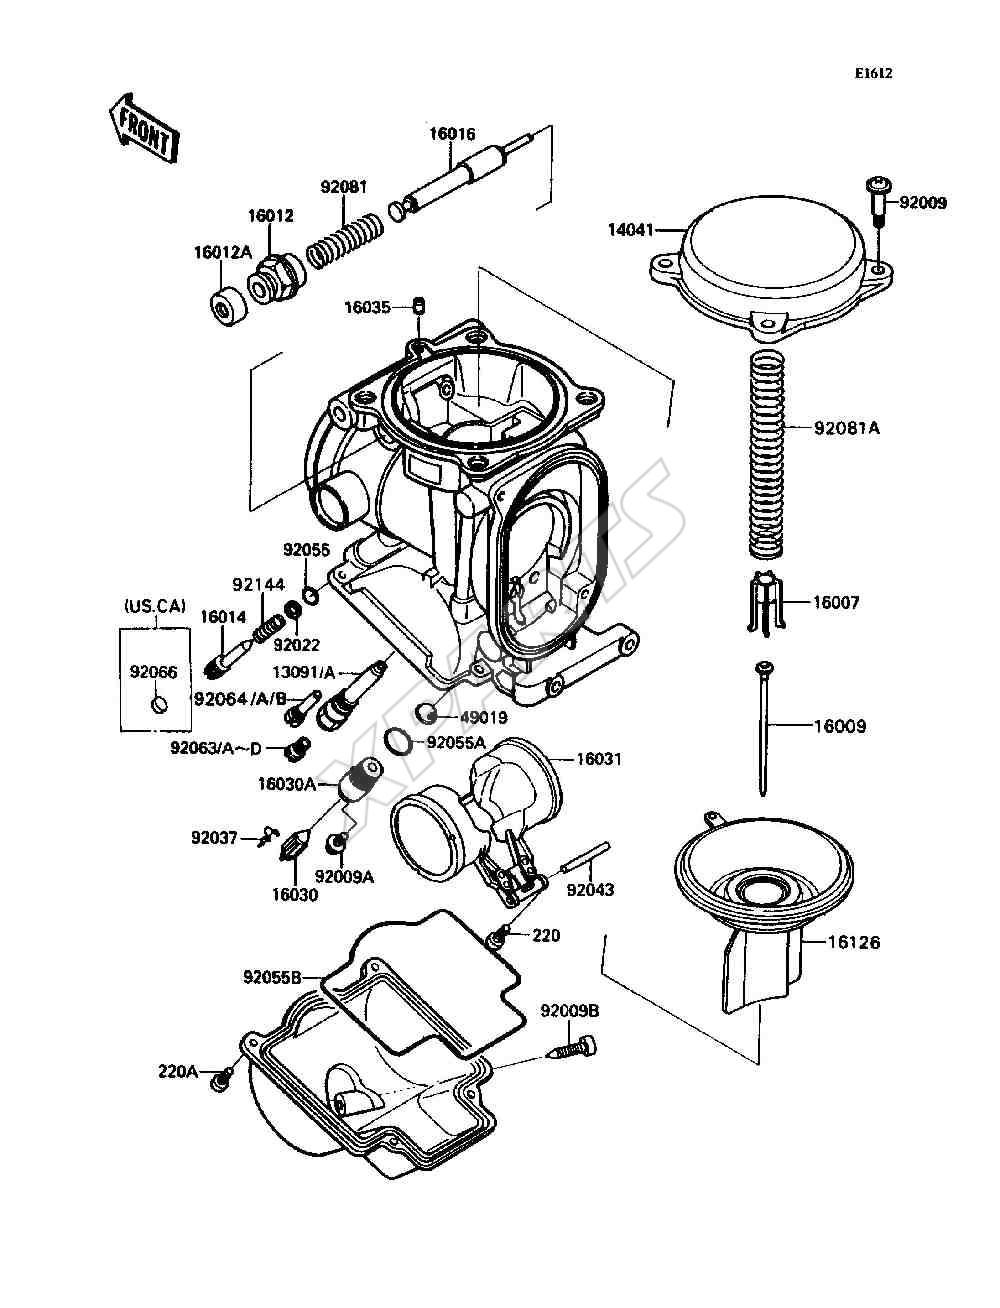 wiring diagram kz750 chopper  wiring  get free image about